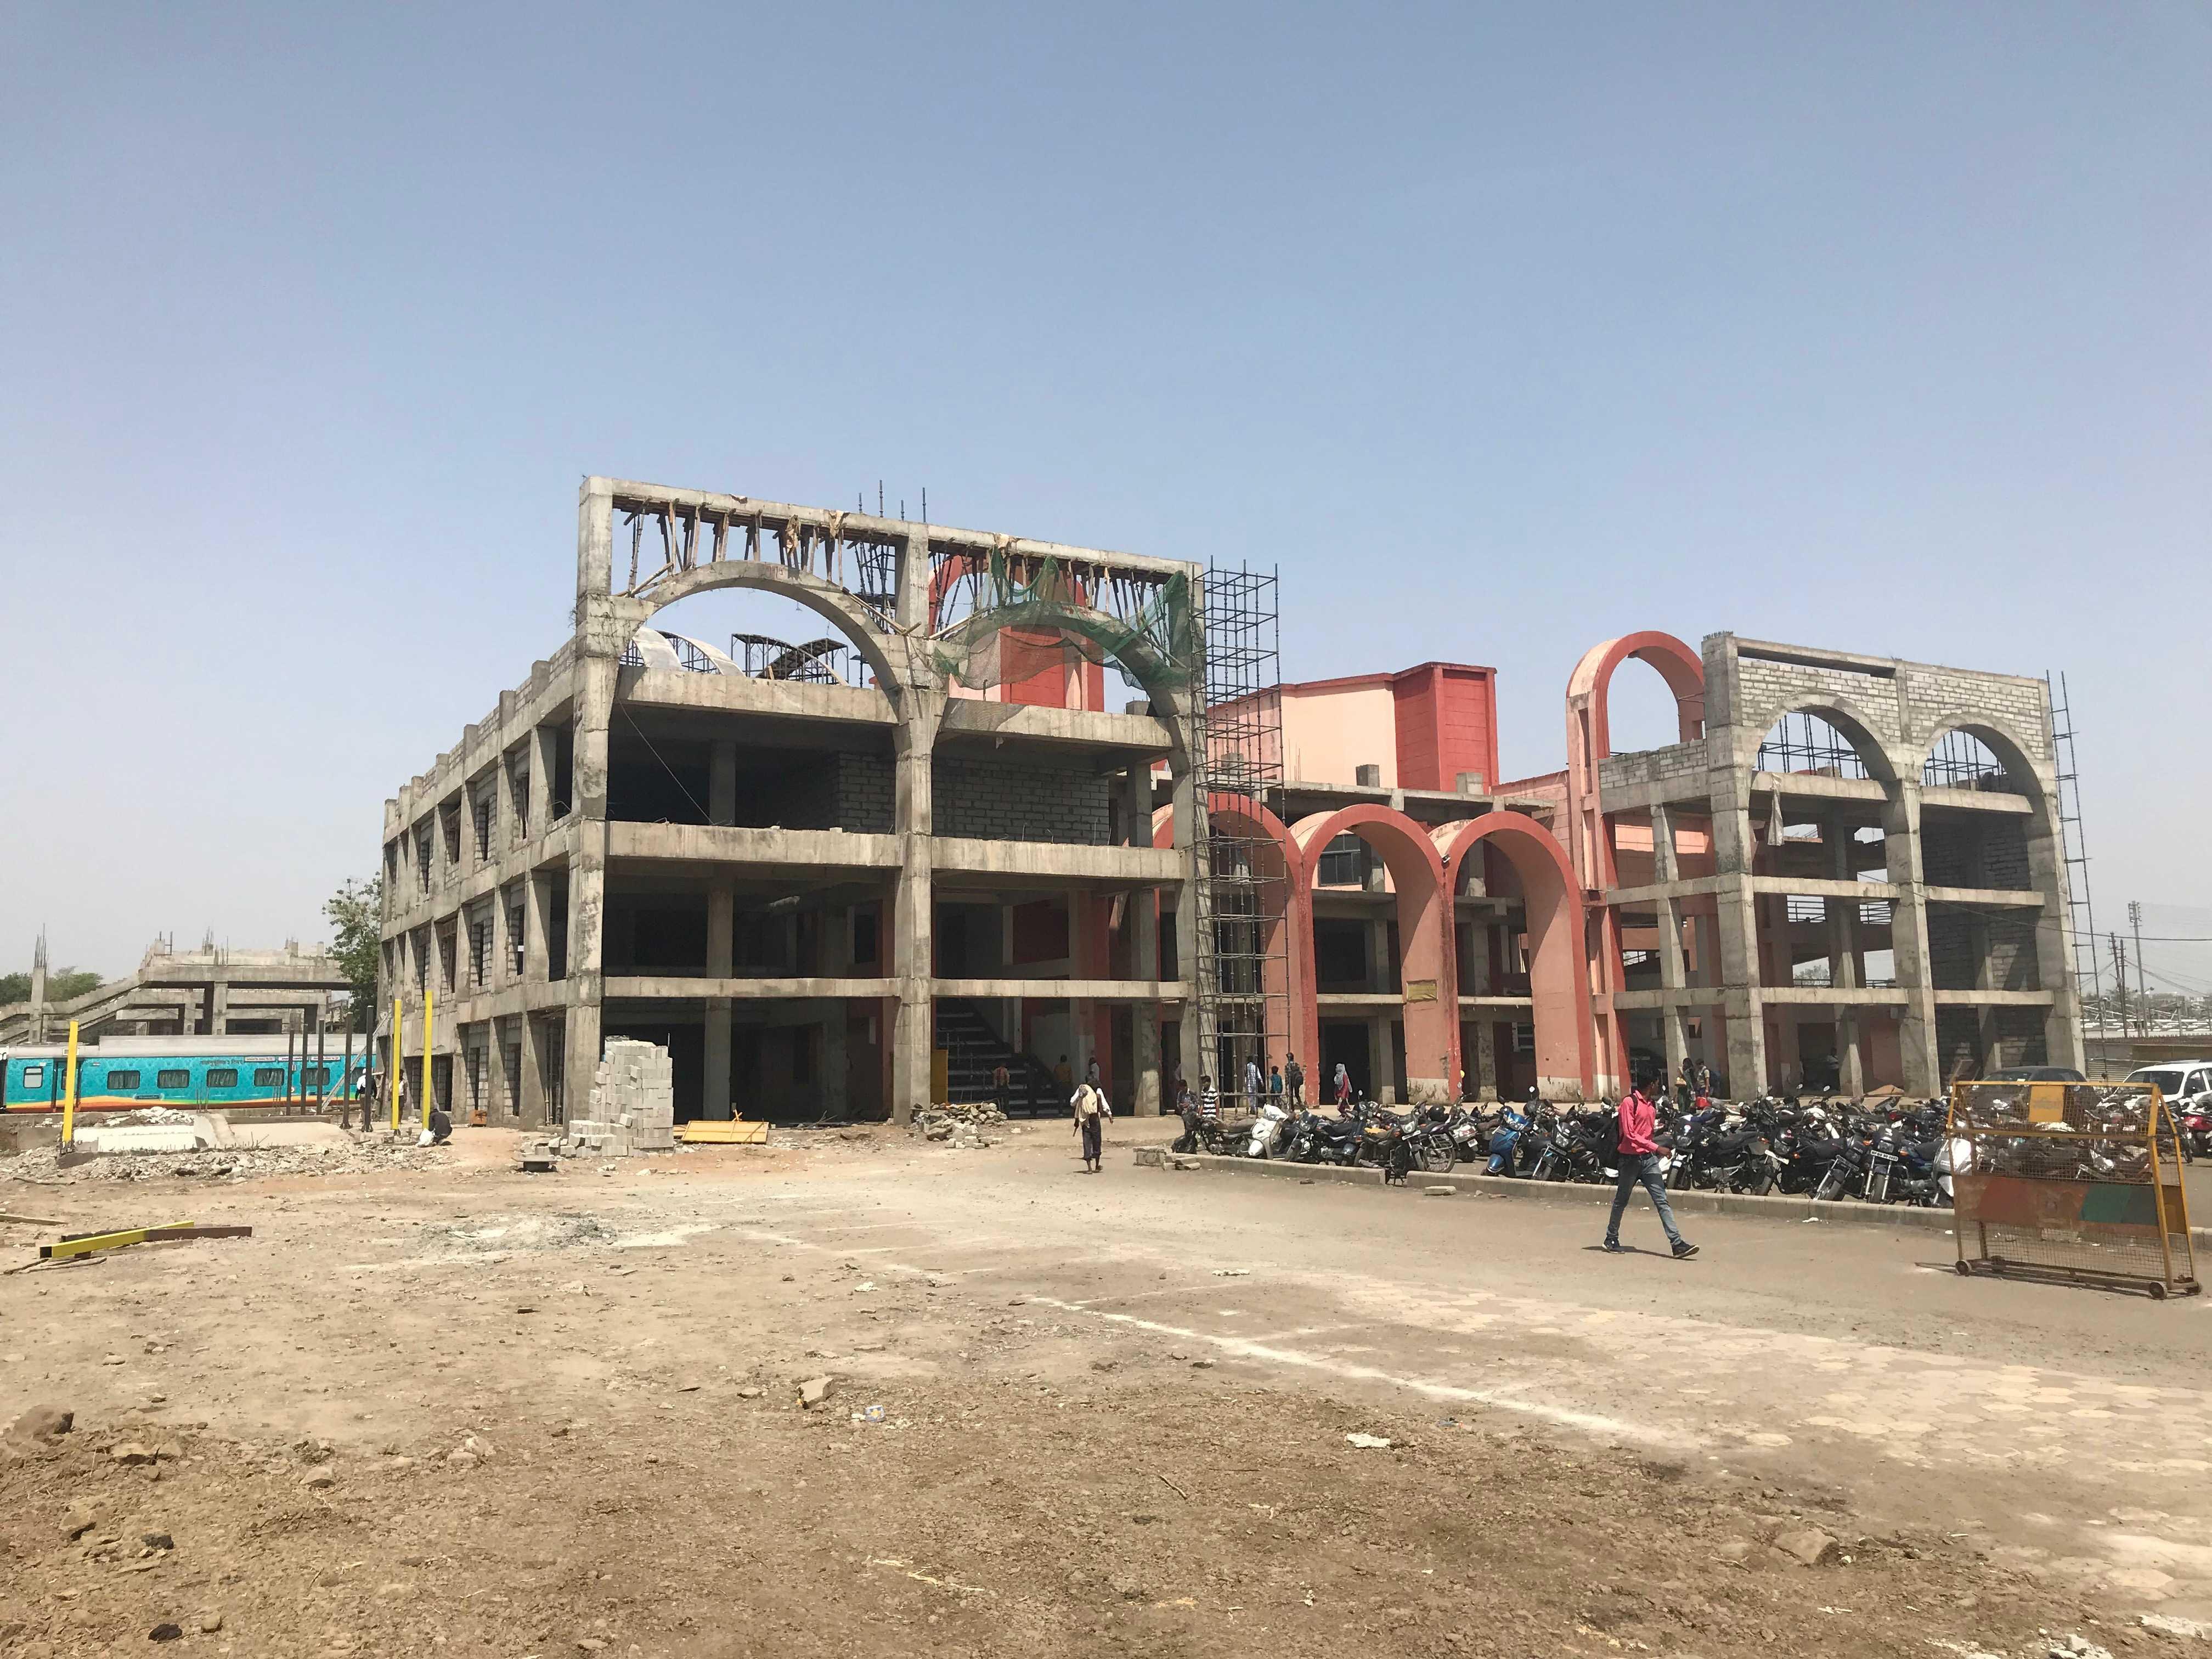 Habibganj - East Building